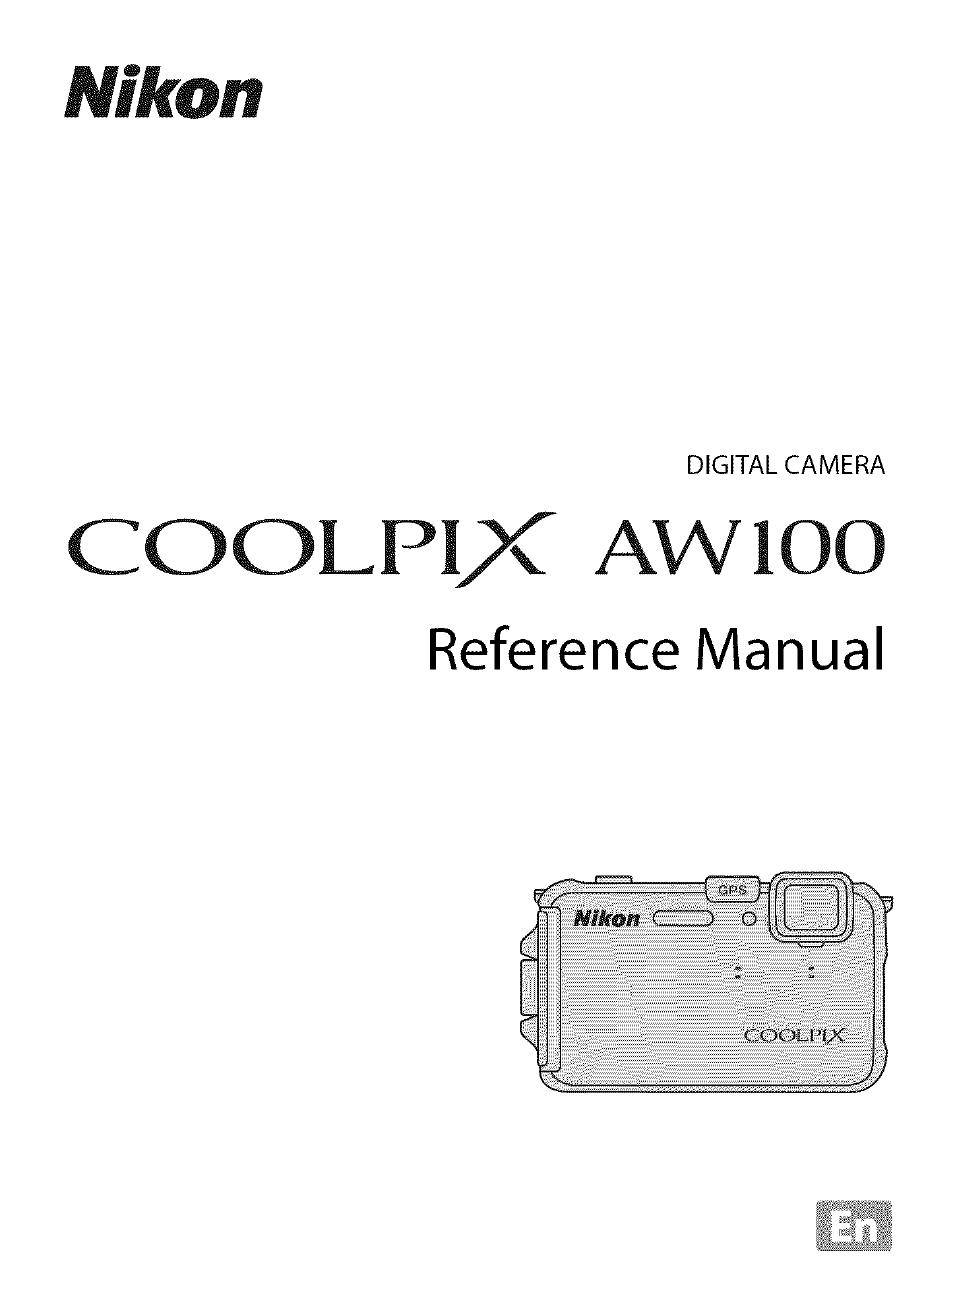 Nikon coolpix aw120 | compact rugged digital camera w/ wifi.